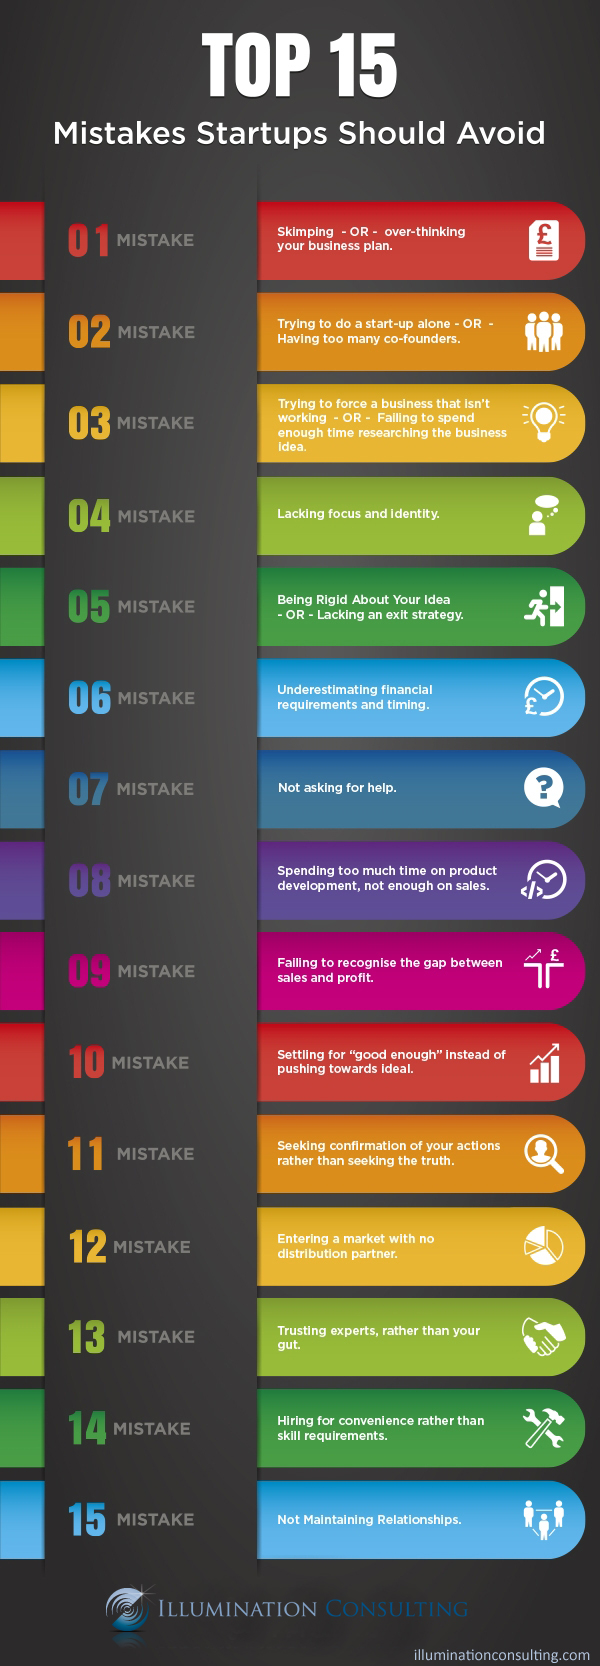 business-startup-mistakes-avoid